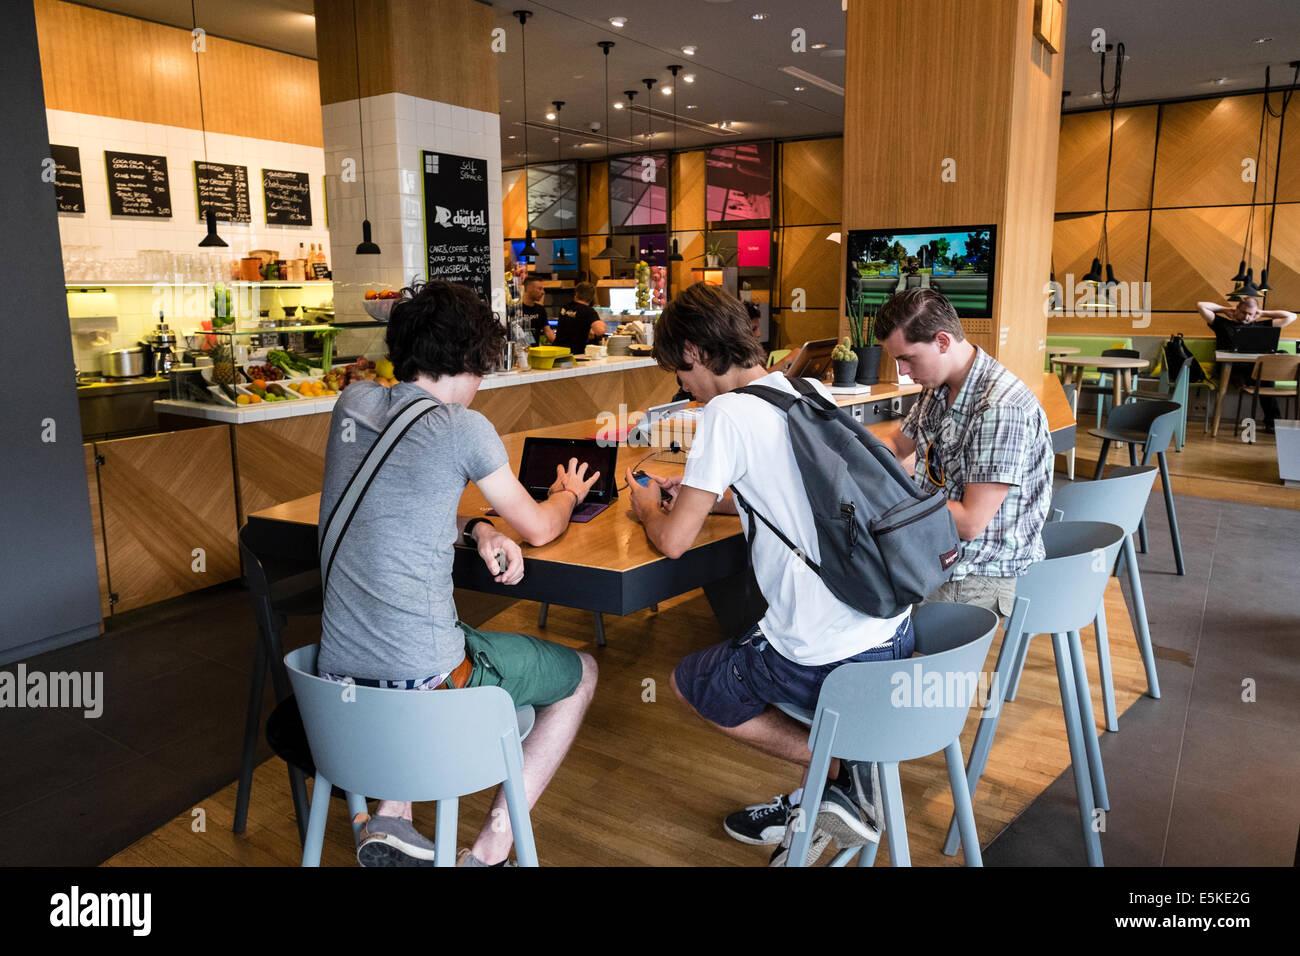 neue Microsoft Digital lokal Café unter Den Linden in Berlin Deutschland Stockbild